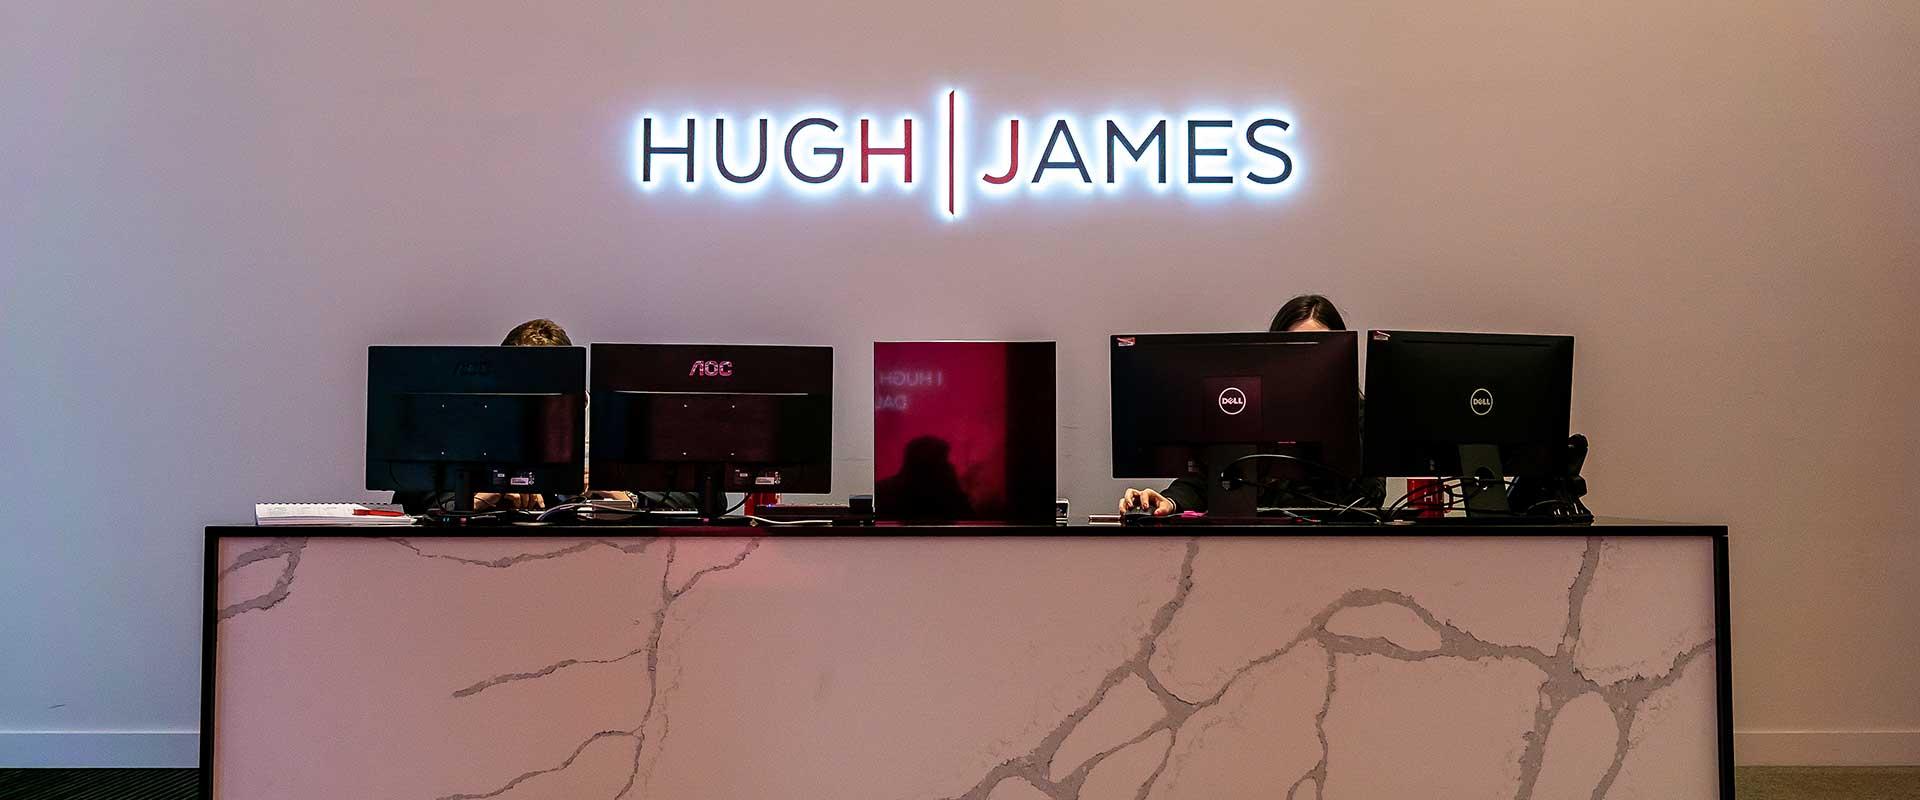 Huw James reception illuminated logo sign Cardiff